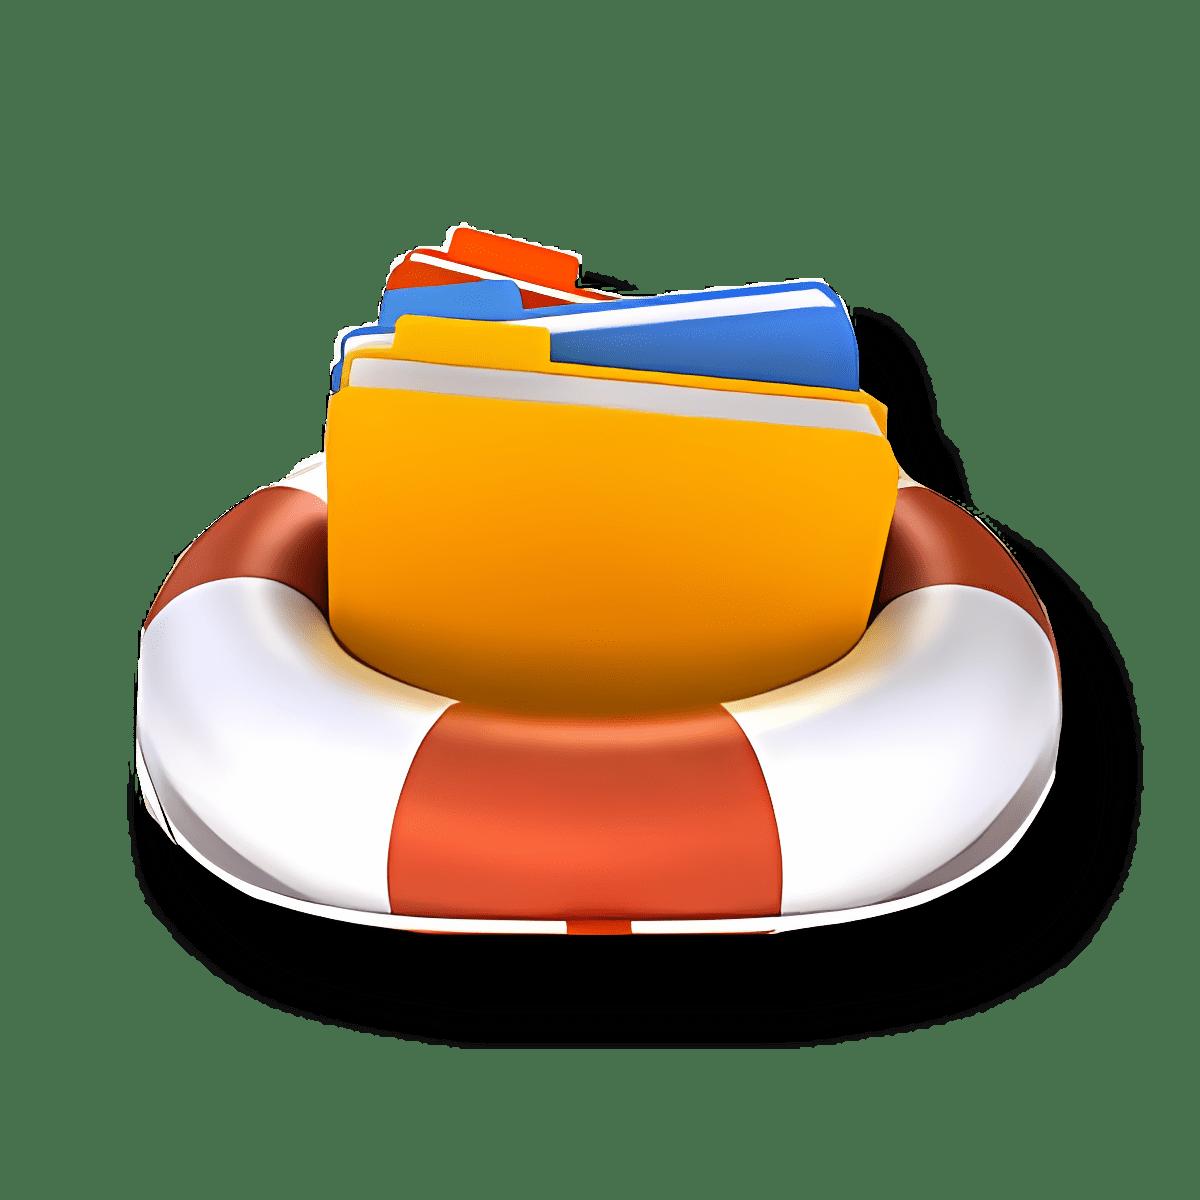 FILERECOVERY 2016 Standard (Mac) 5.5.8.4